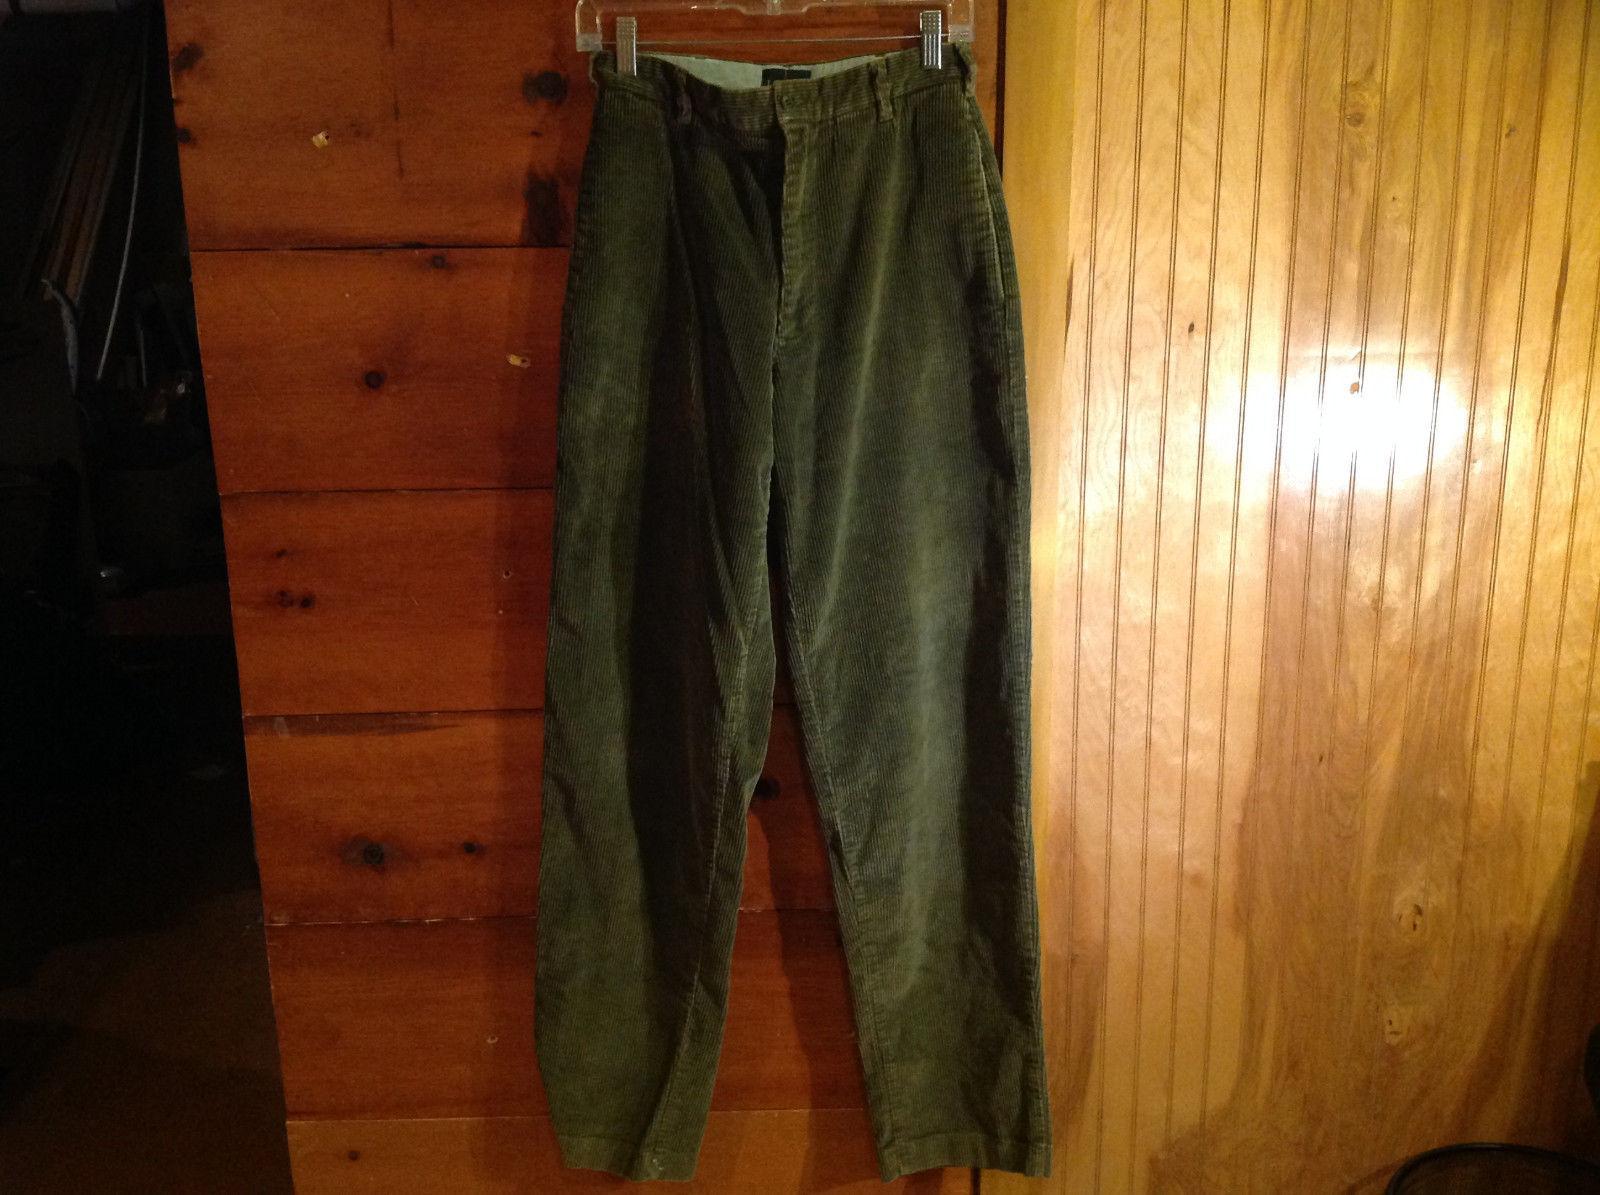 Green Corduroy Four Pocket Pants by J Crew Button Zipper Closure Size 28